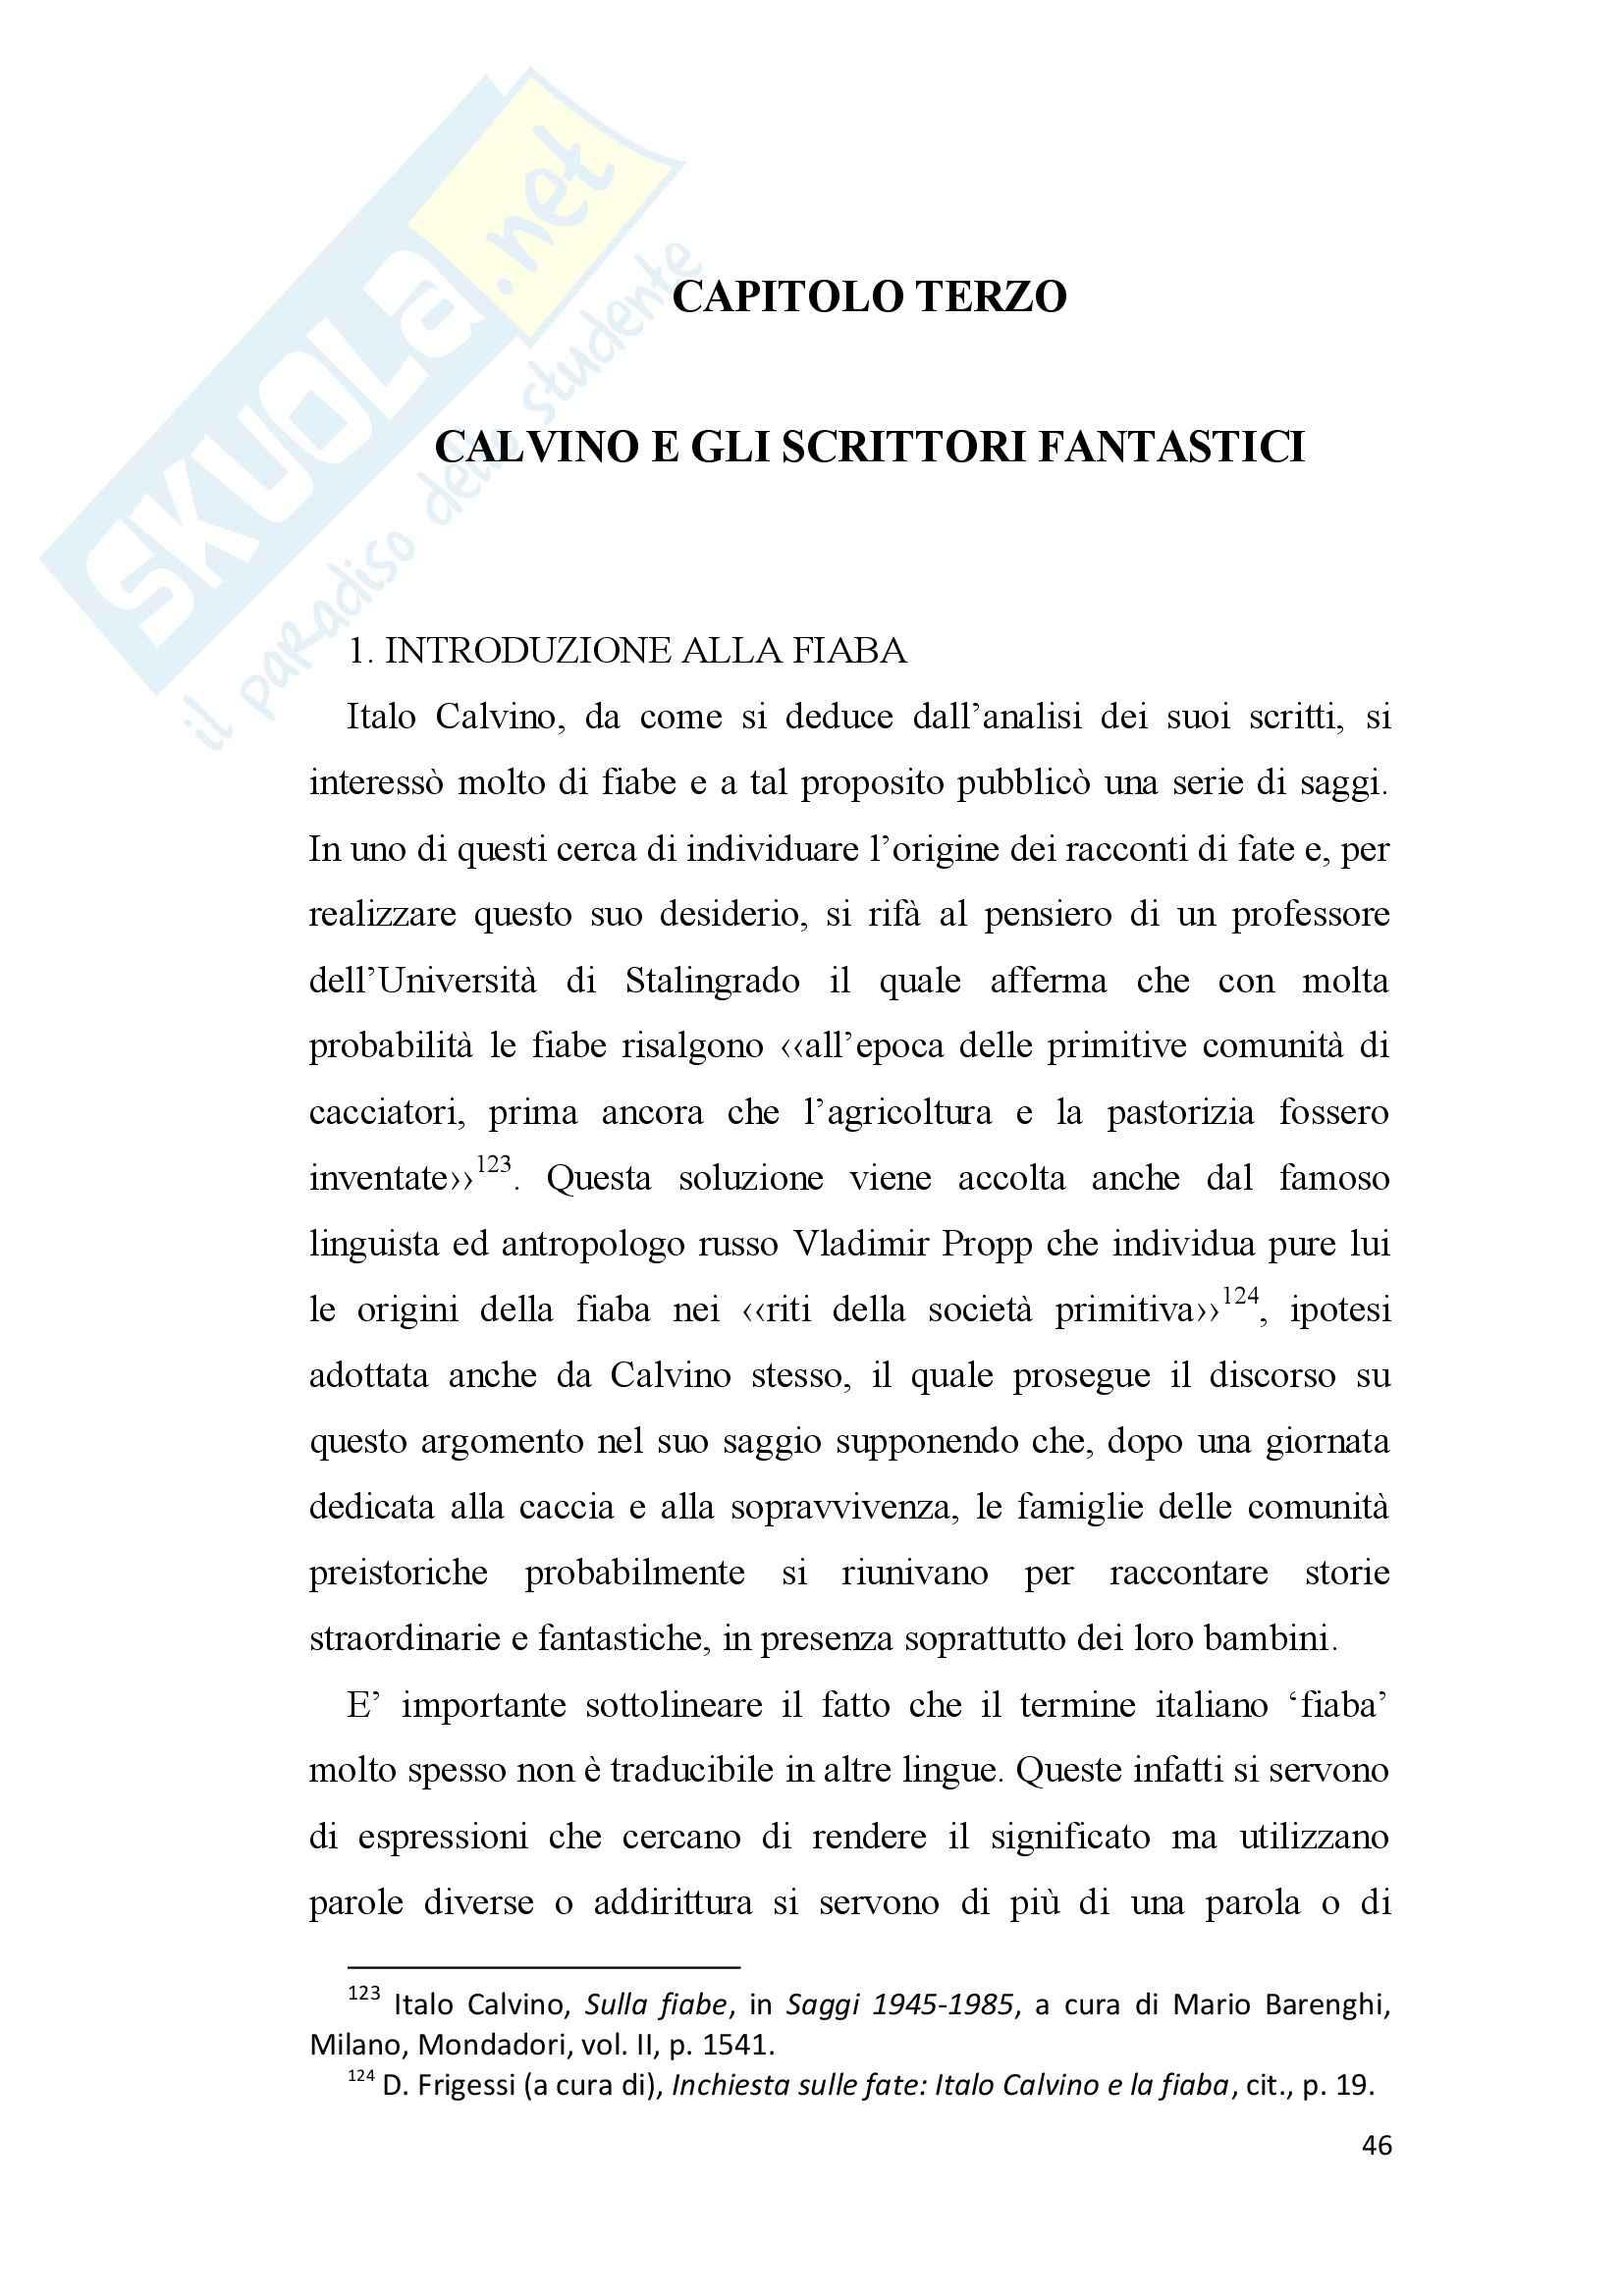 Tesi - Italo Calvino e il fantastico Pag. 46